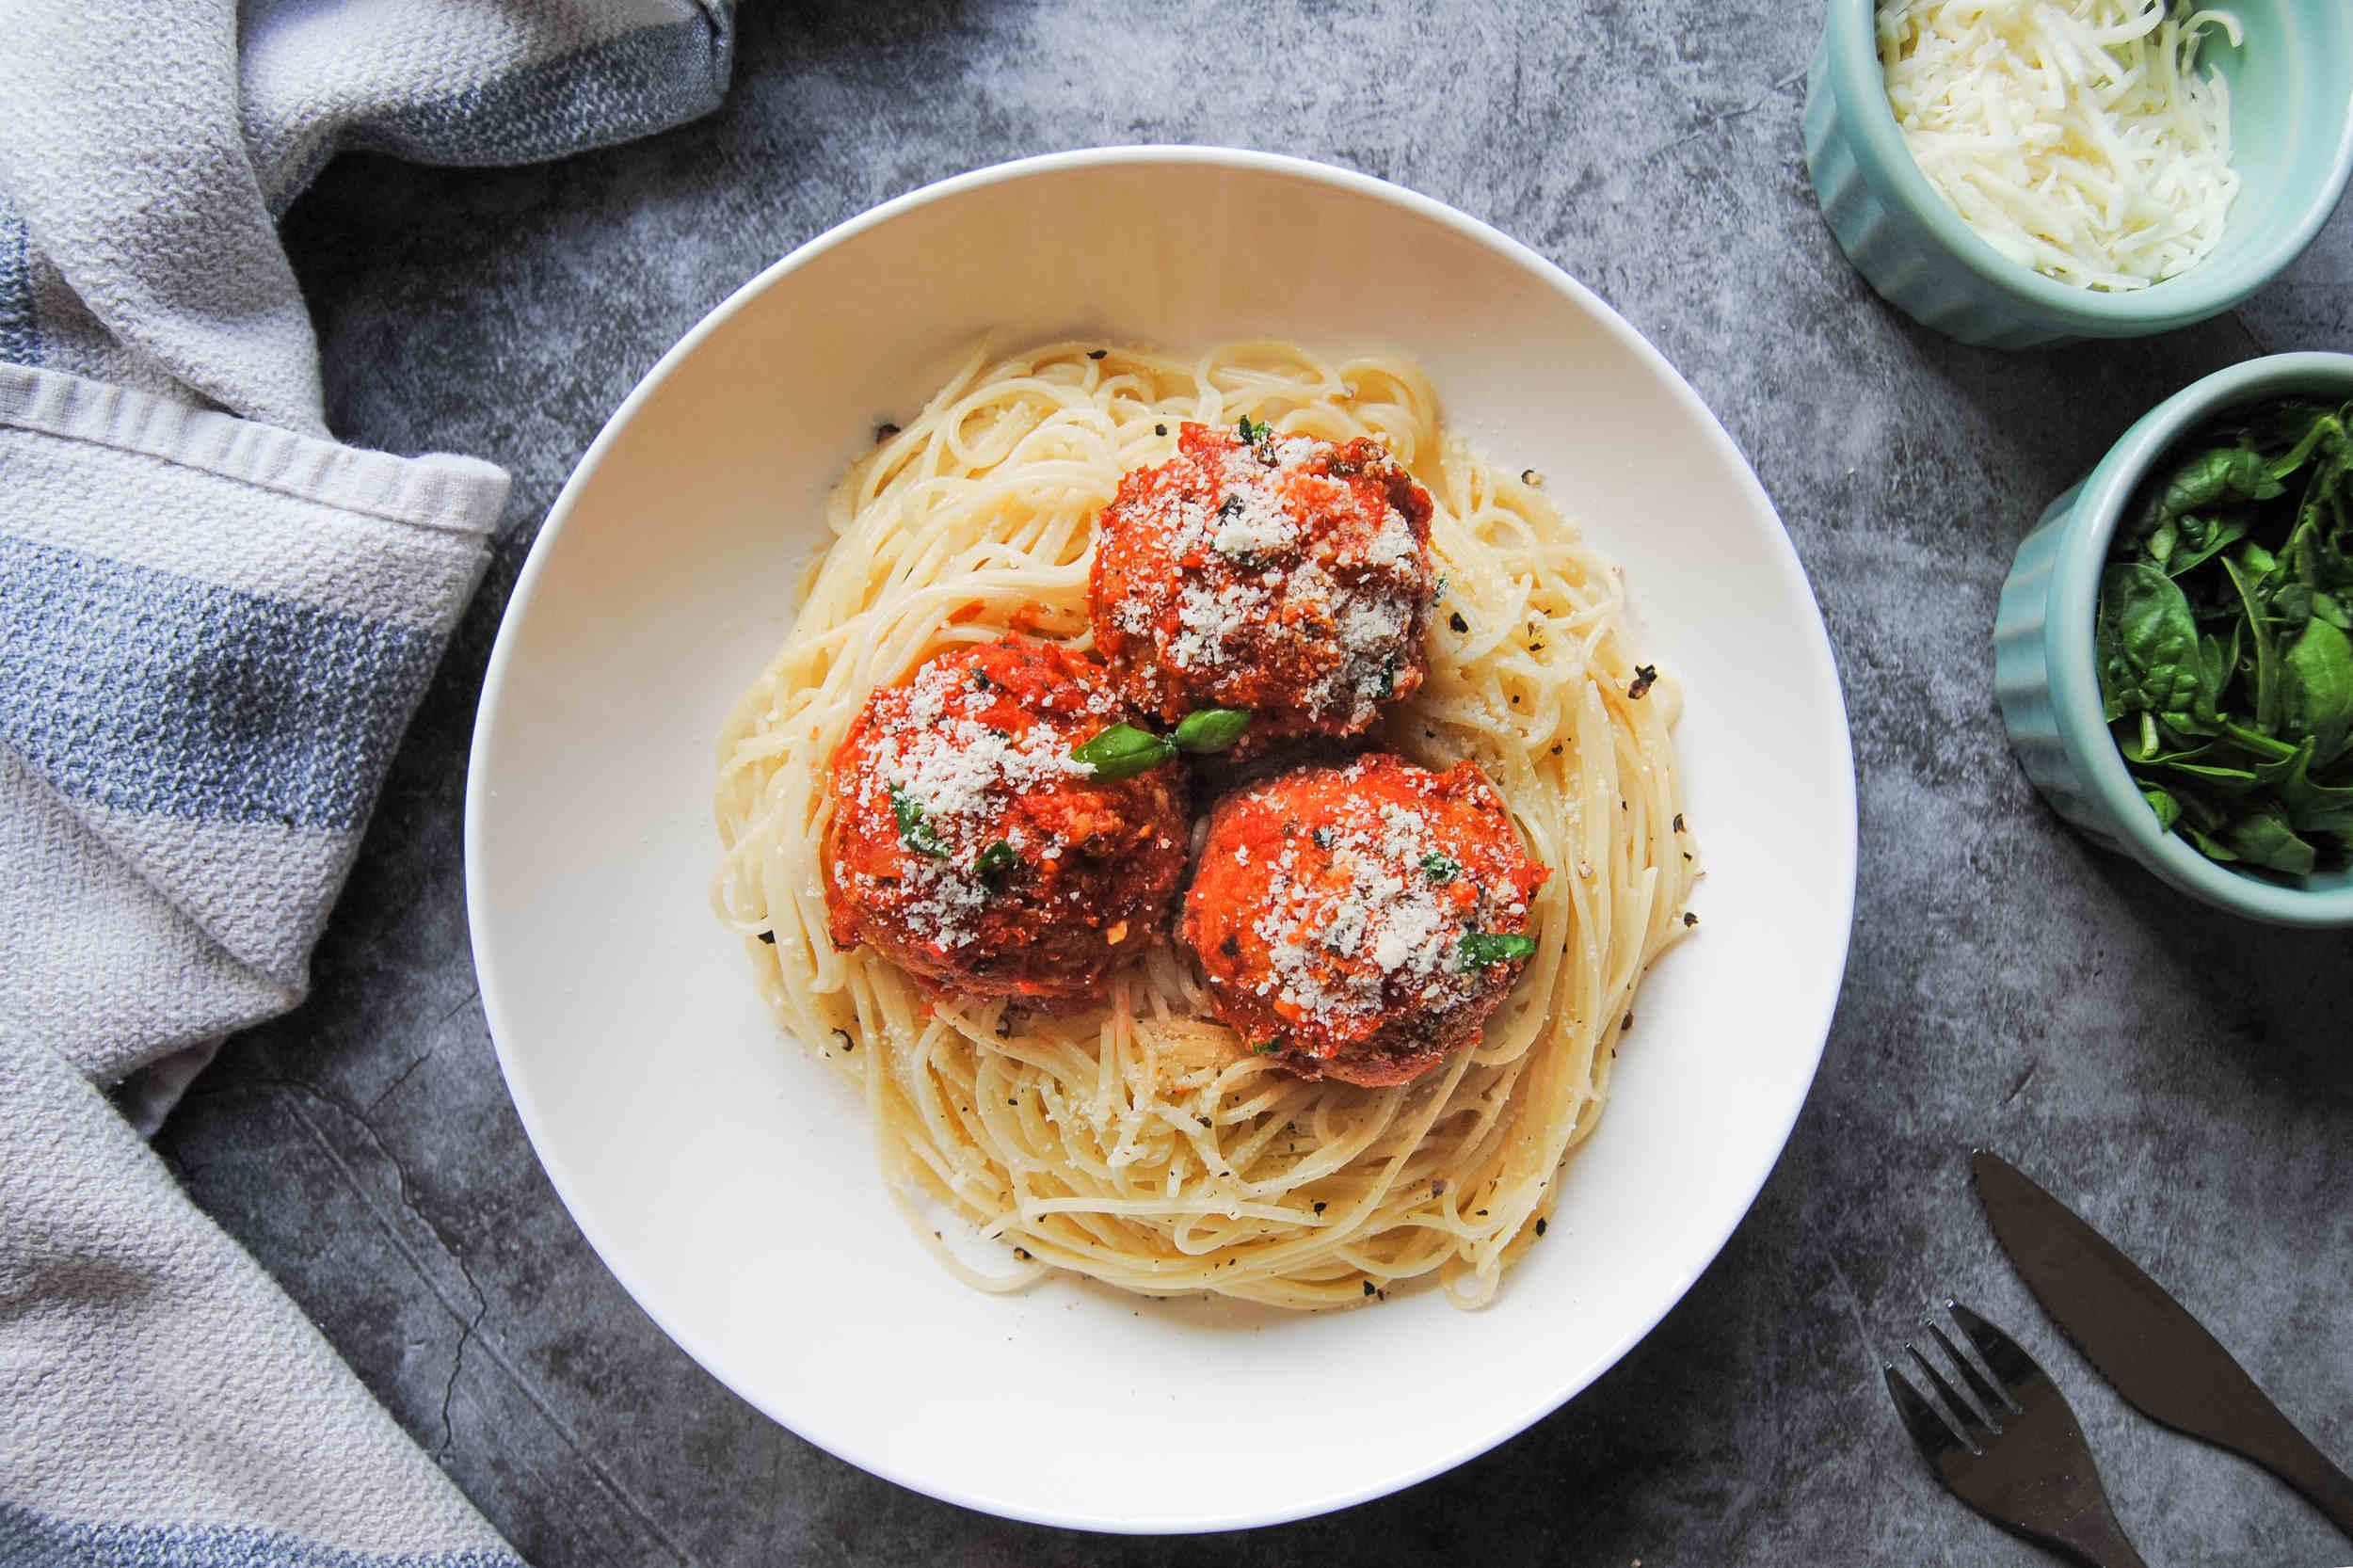 Meatless Chickpea Meatballs In Marinara - Featured Image